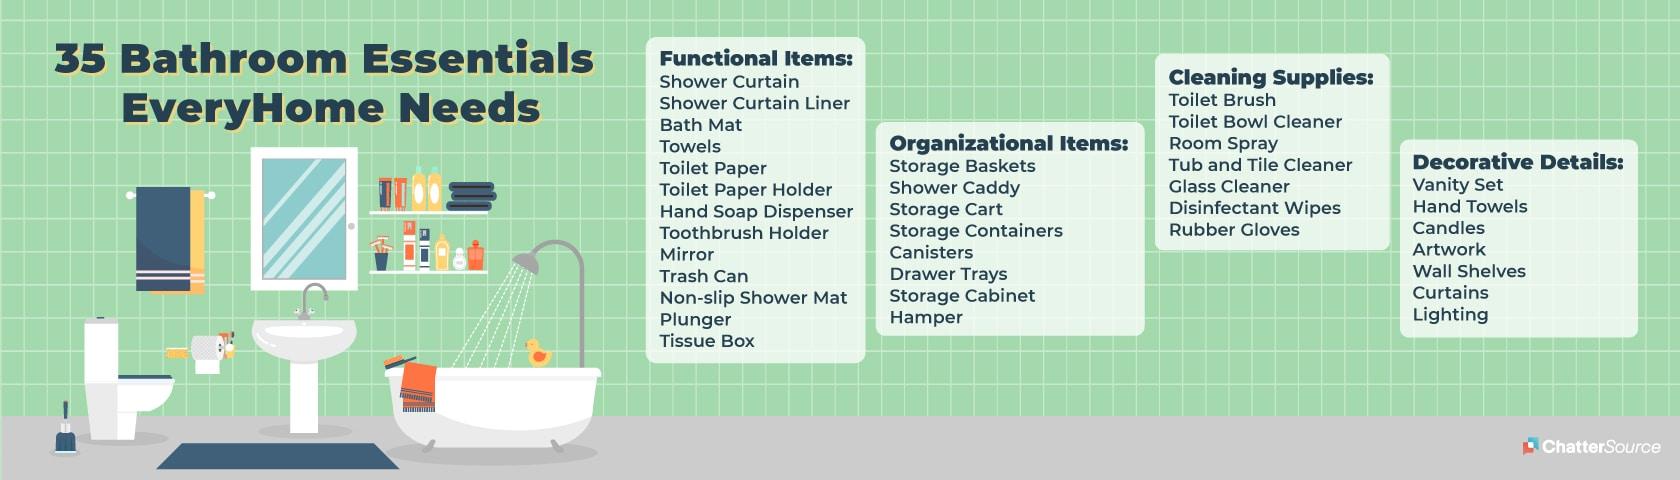 Bathroom essentials infographic